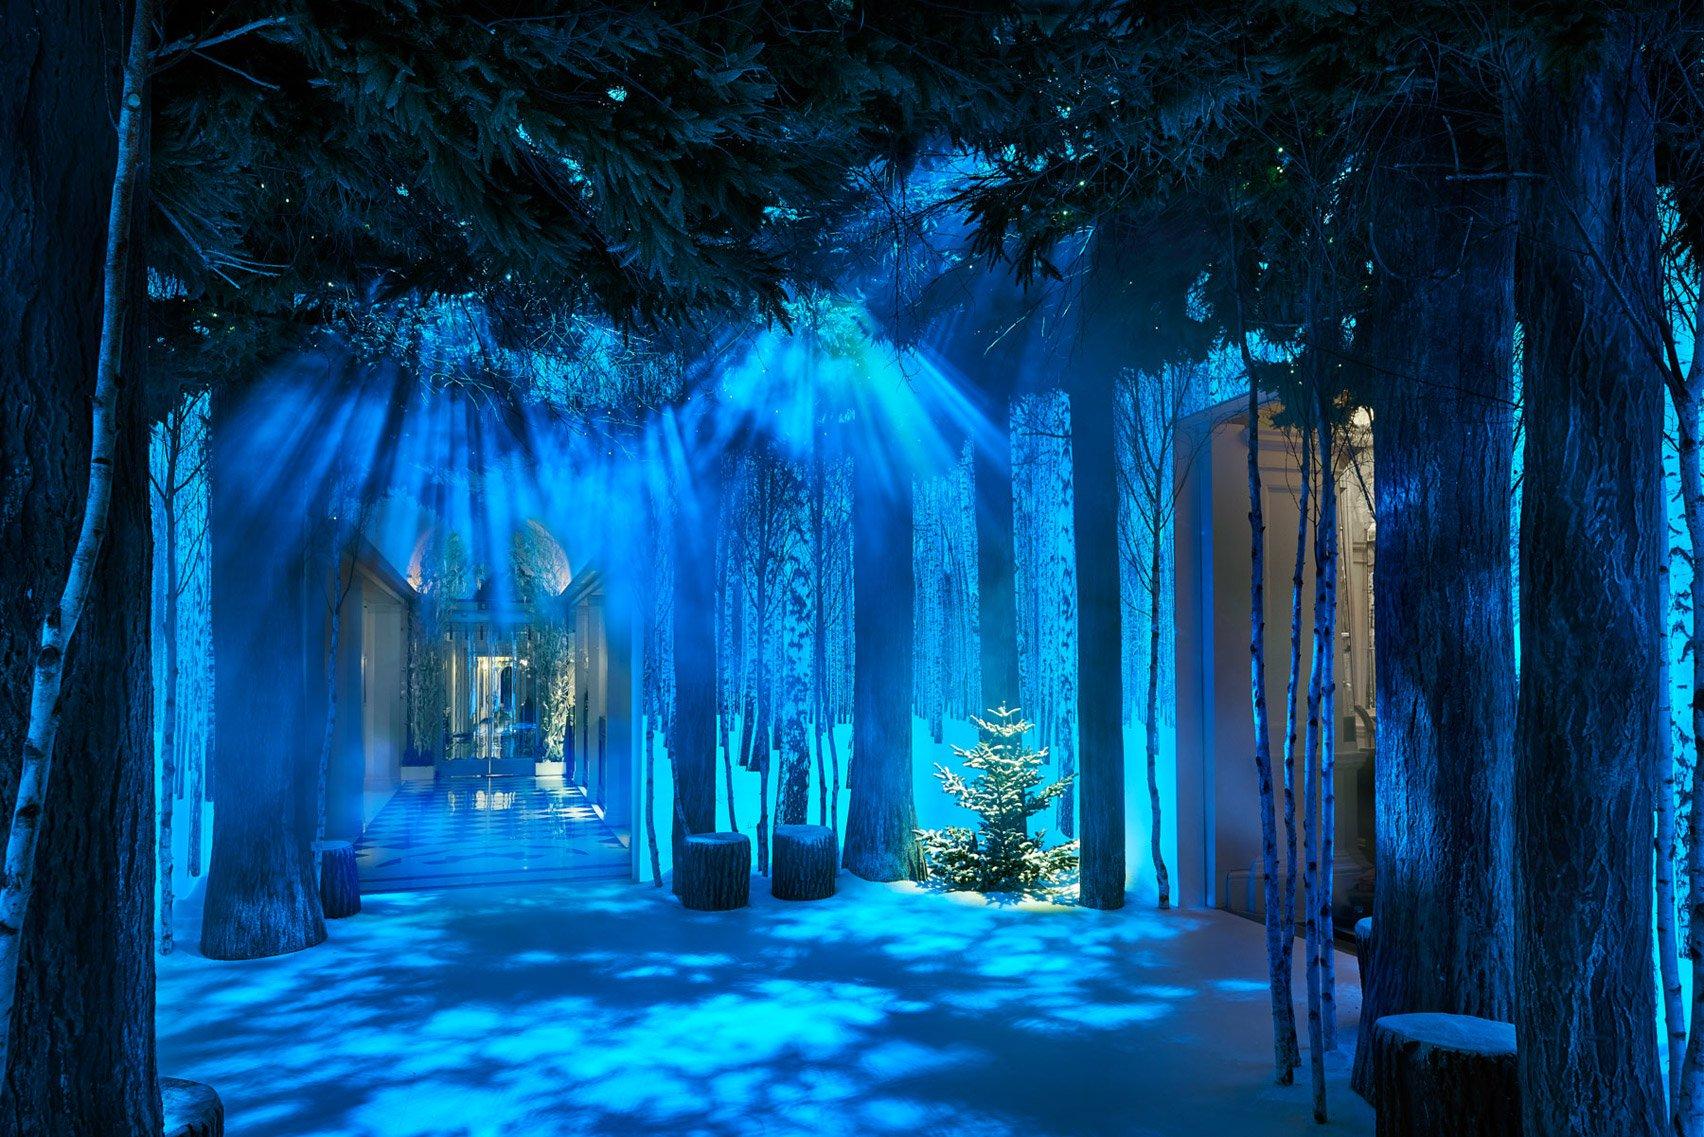 jony-ive-marc-newson-christmas-tree-design-claridges-london_dezeen_1704_col_2